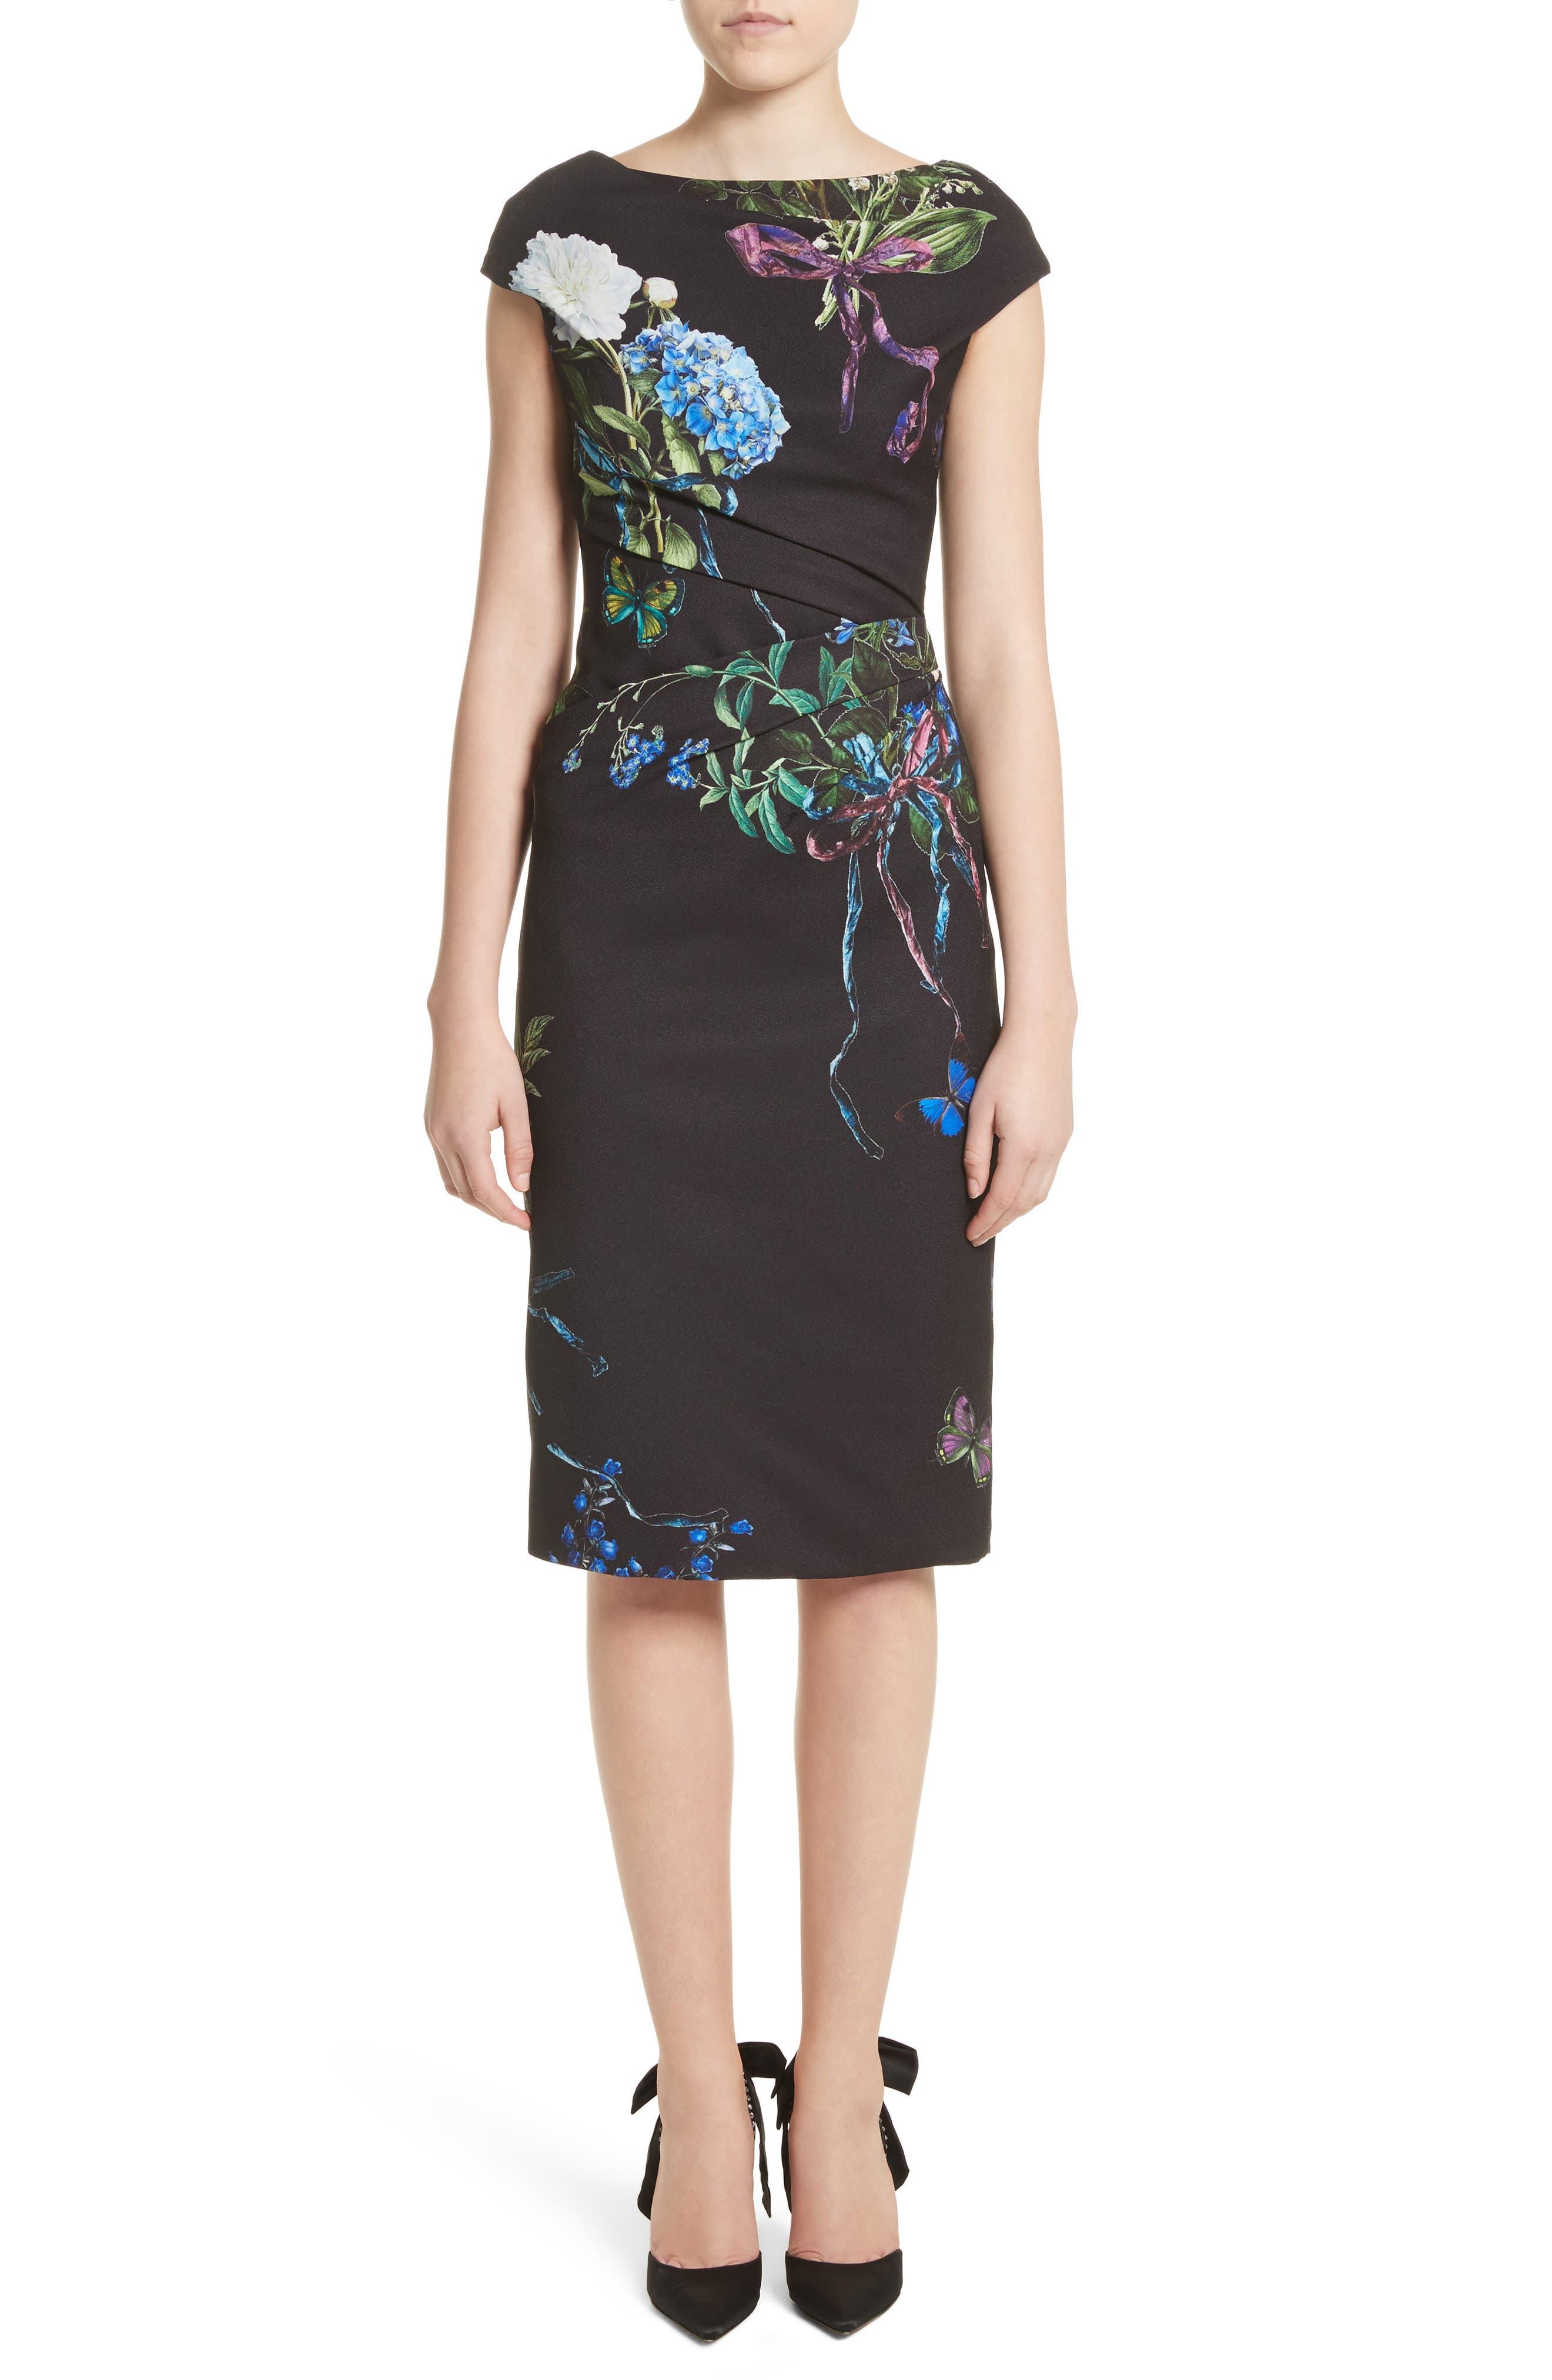 Alternate Image 1 Selected - Monique Lhuillier Botanical Print Draped Sheath Dress